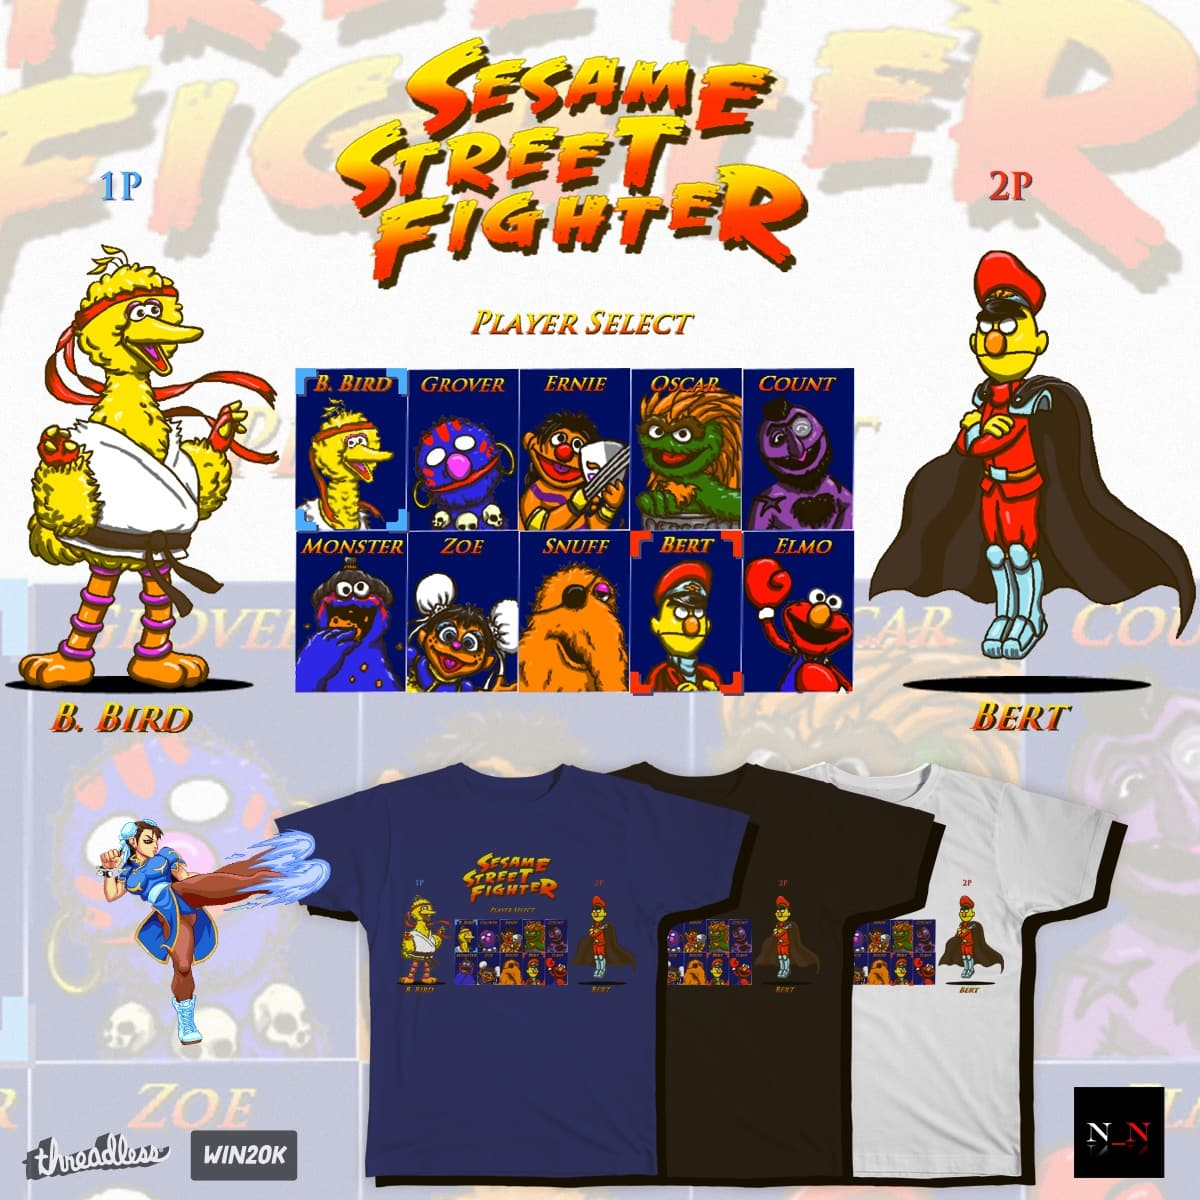 Sesame Street Fighter by Nick_Nightshade on Threadless